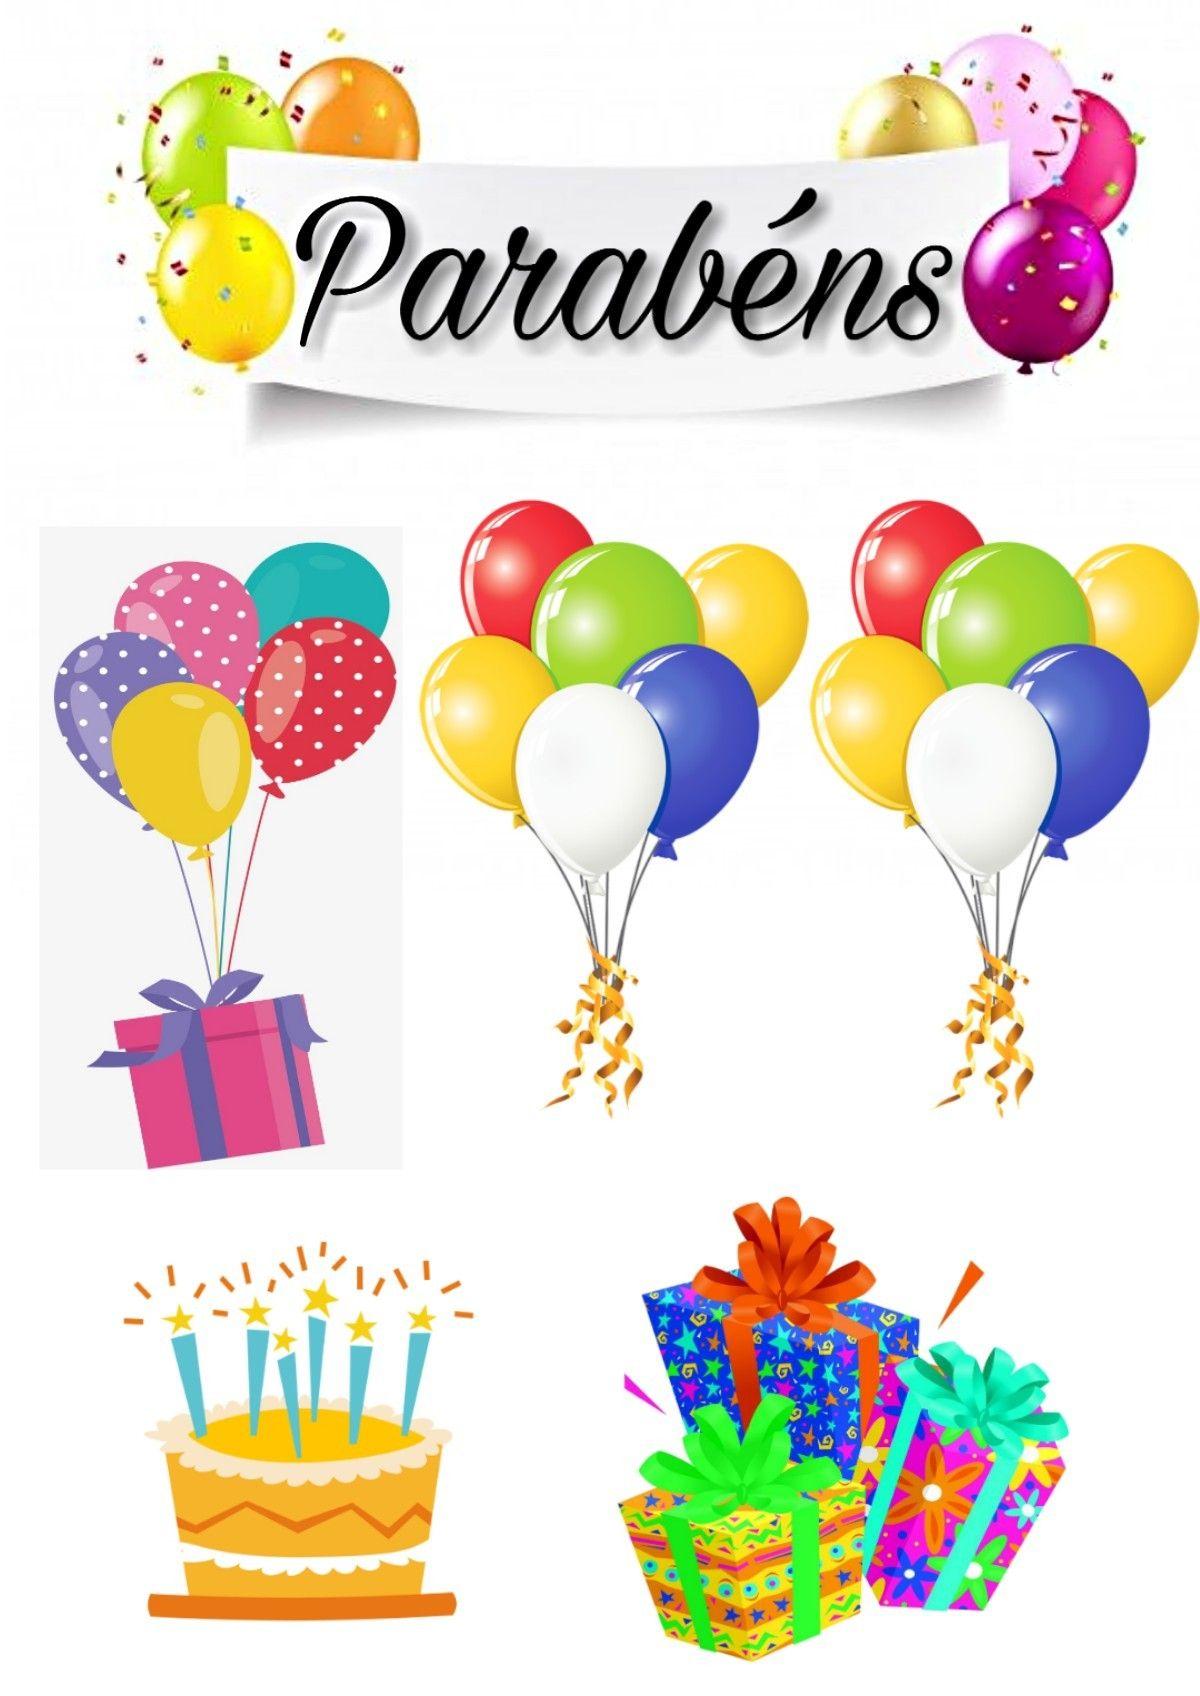 Parabéns a você - Página 4 9a8b202b0dccb558d9f3a660b6222b34